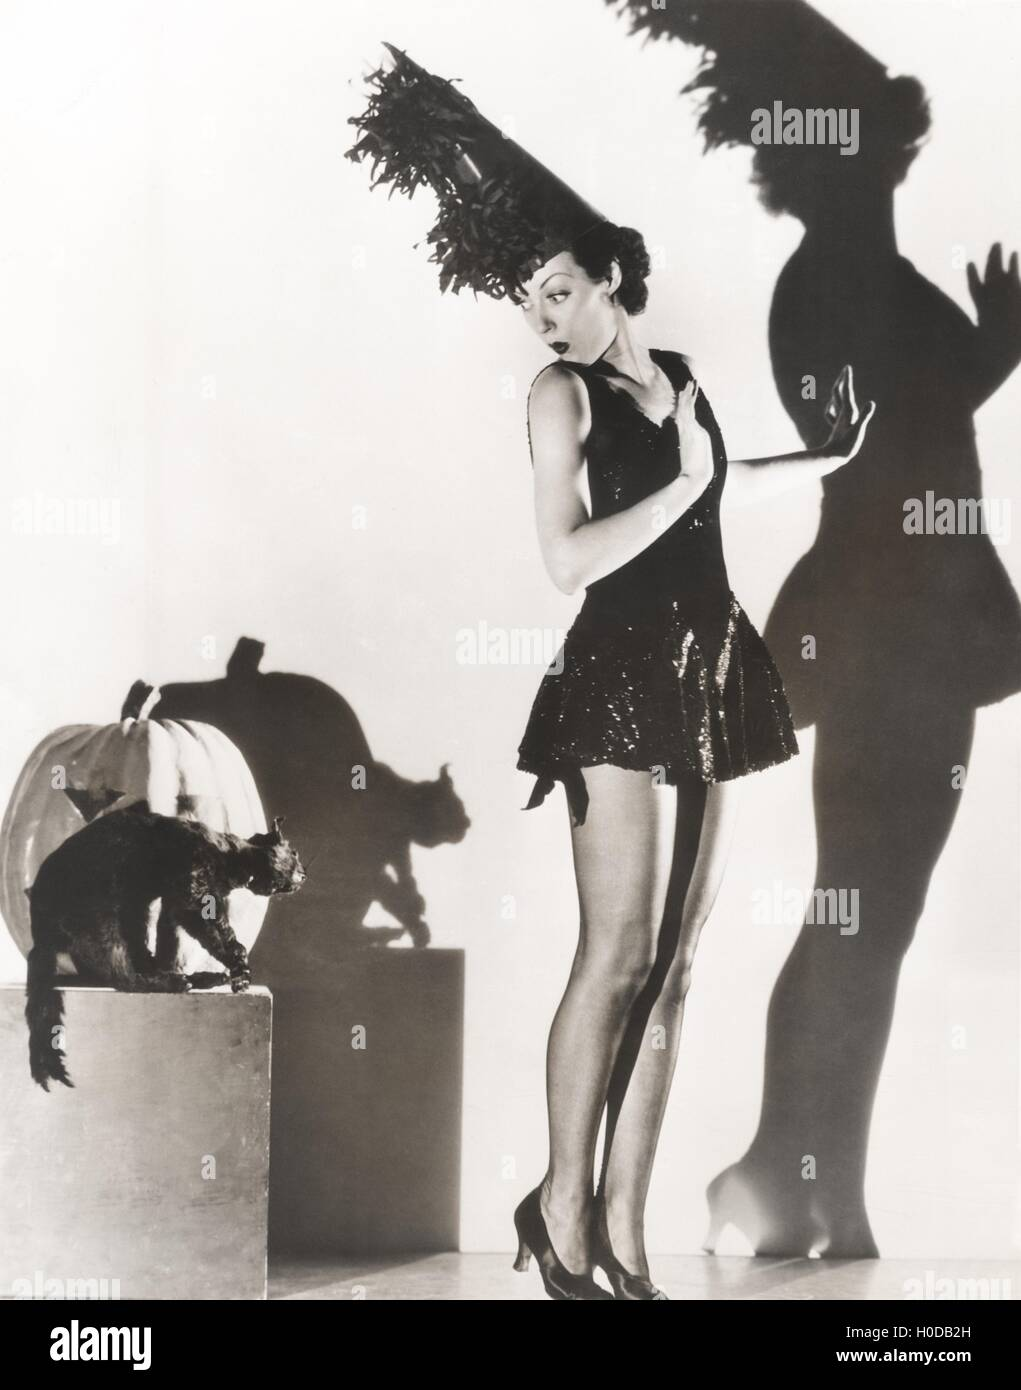 Black cat giving woman in costume the heebie-jeebies - Stock Image